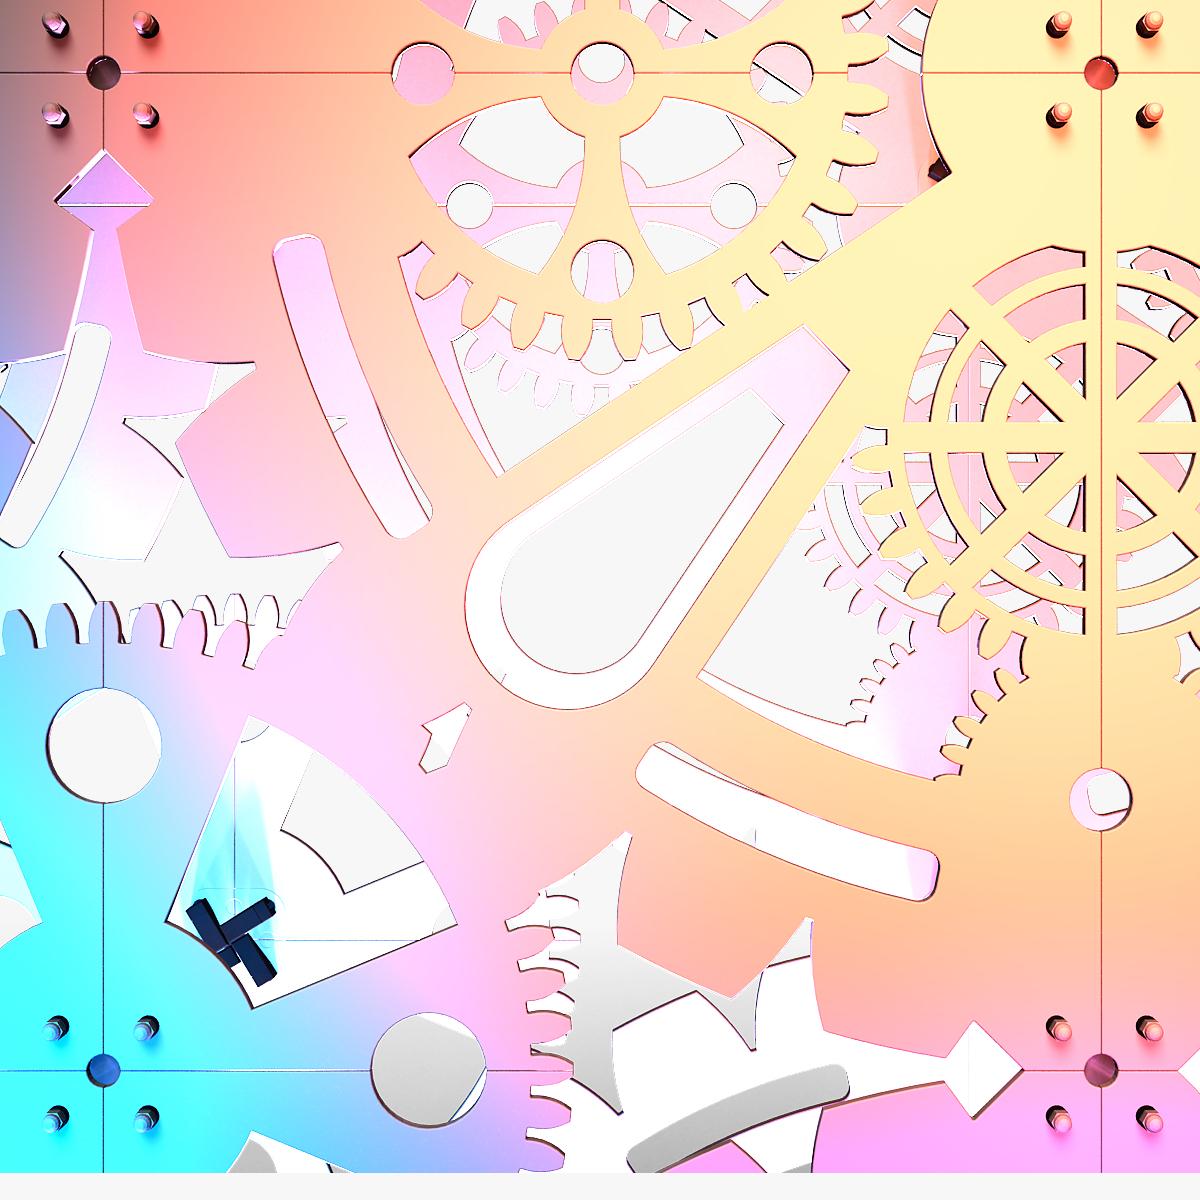 70-01-07-1200x1200.jpg Download STL file Stage Decor Collection 01 (Modular 9 Pieces) • 3D printer model, akerStudio